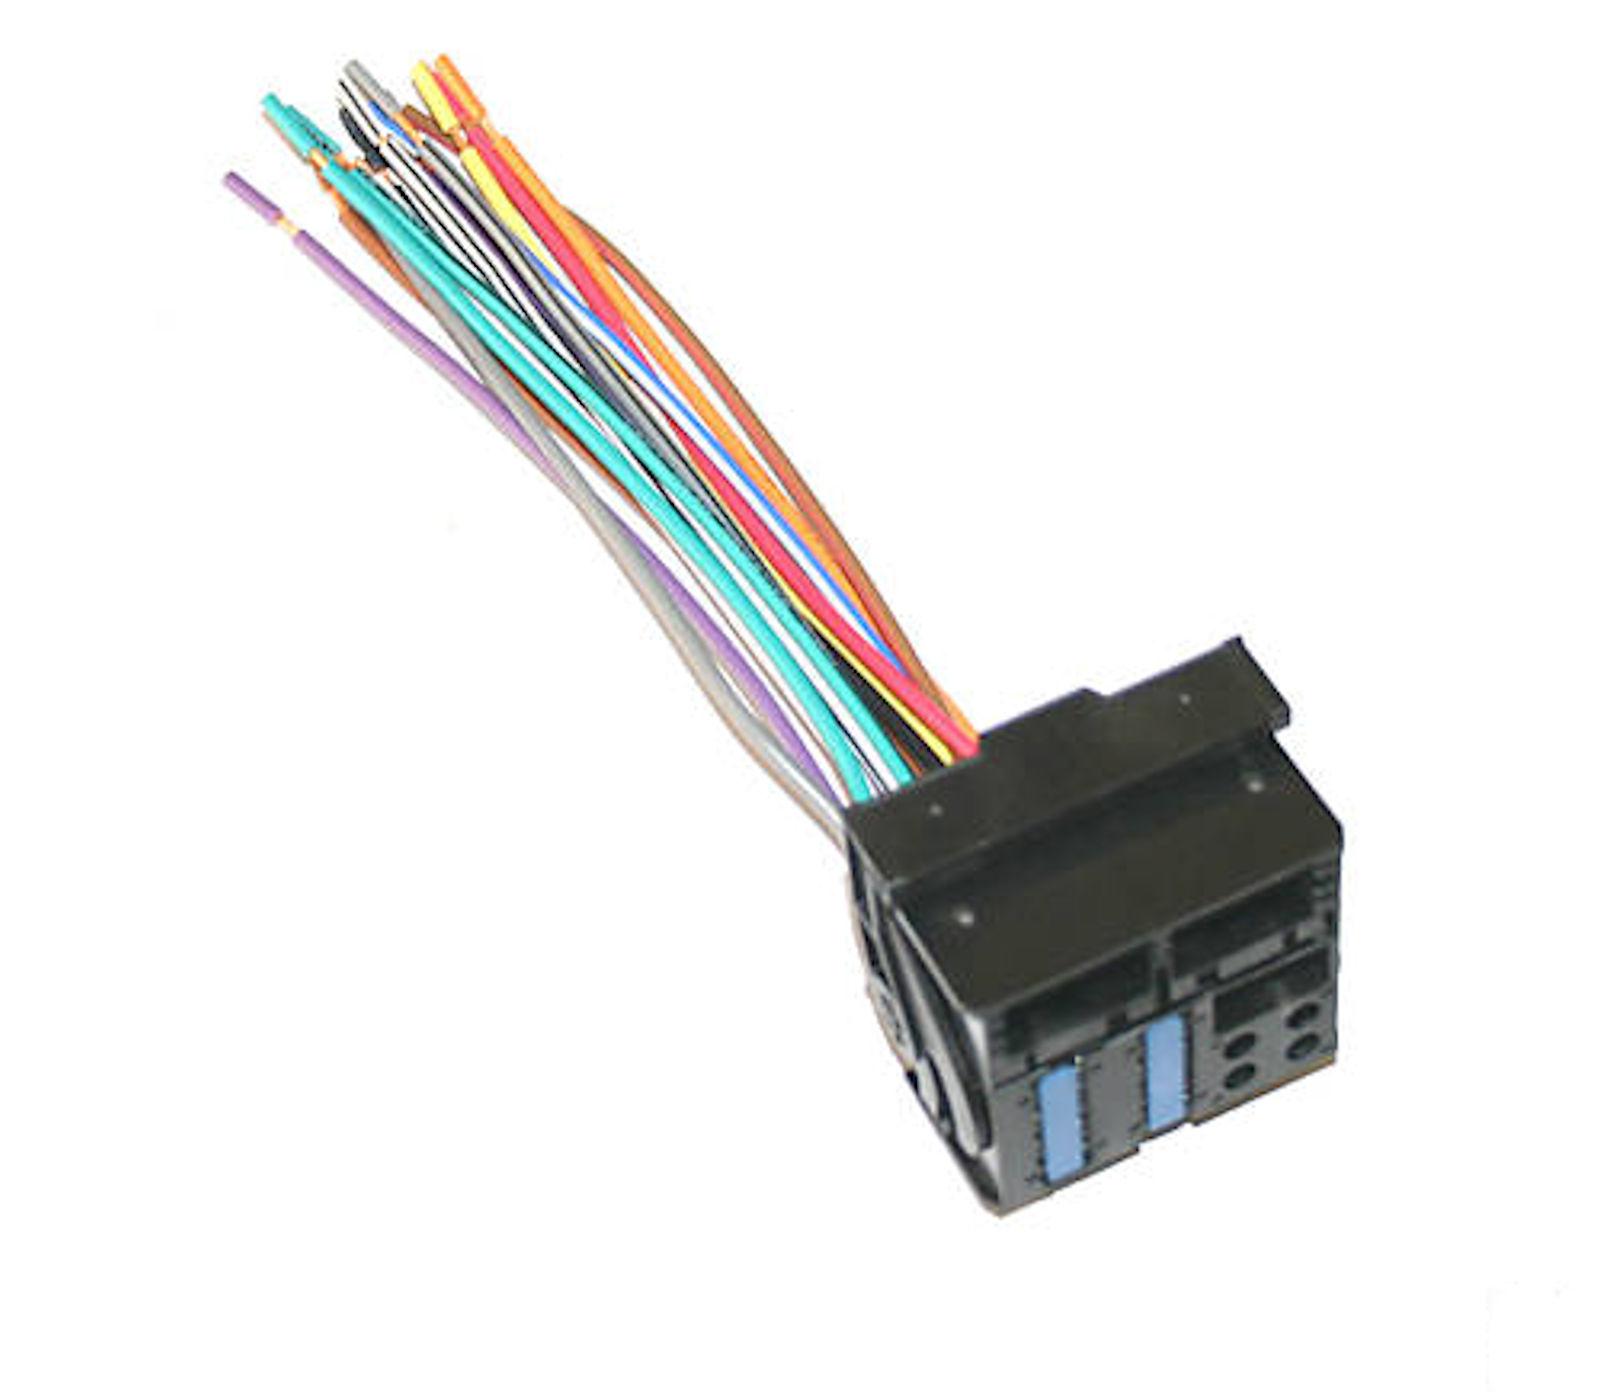 2002 bmw x5 key wiring harness. wiring harness for factory radio  installation 2002 2003. bmw e53 x5 x3 z4 factory ipod interface kit w wiring.  2002 2008 bmw 3 series 5 series  2002-acura-tl-radio.info